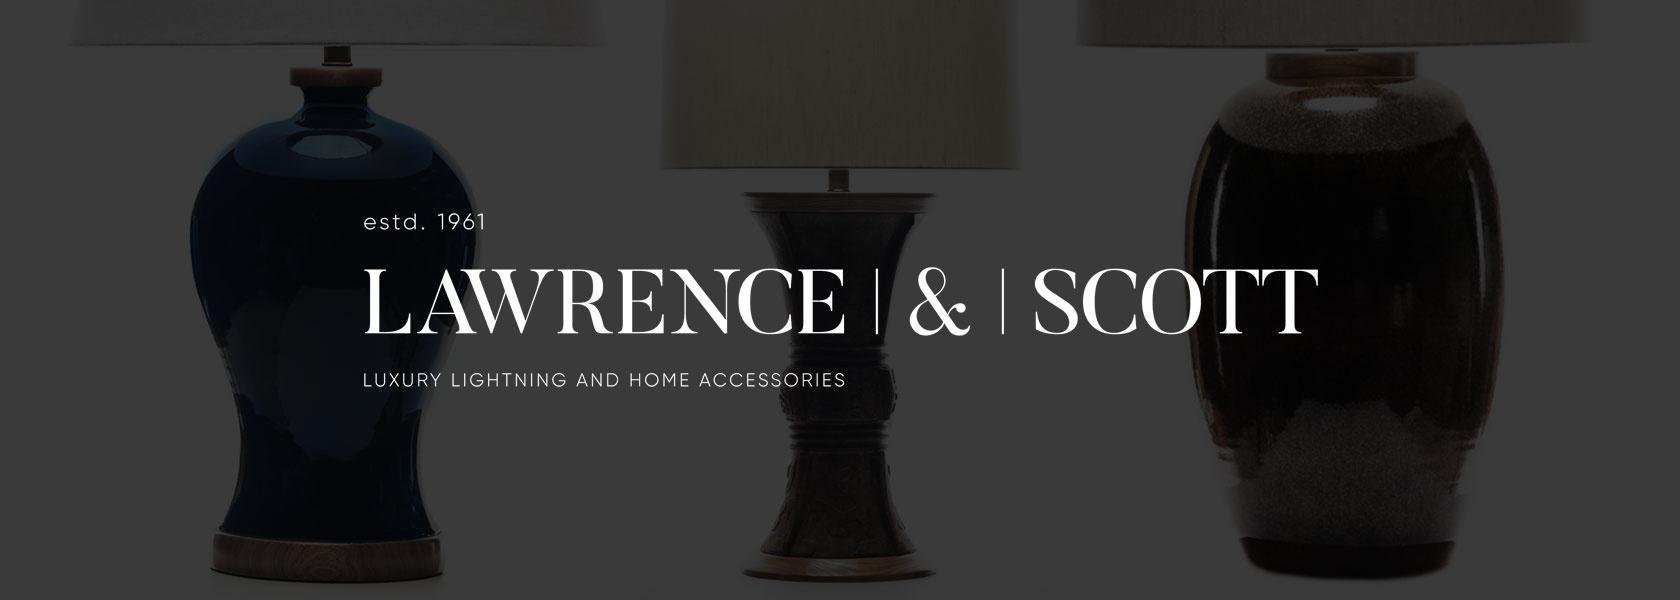 Lawrence & Scott Luxury Porcelain Table Lamps